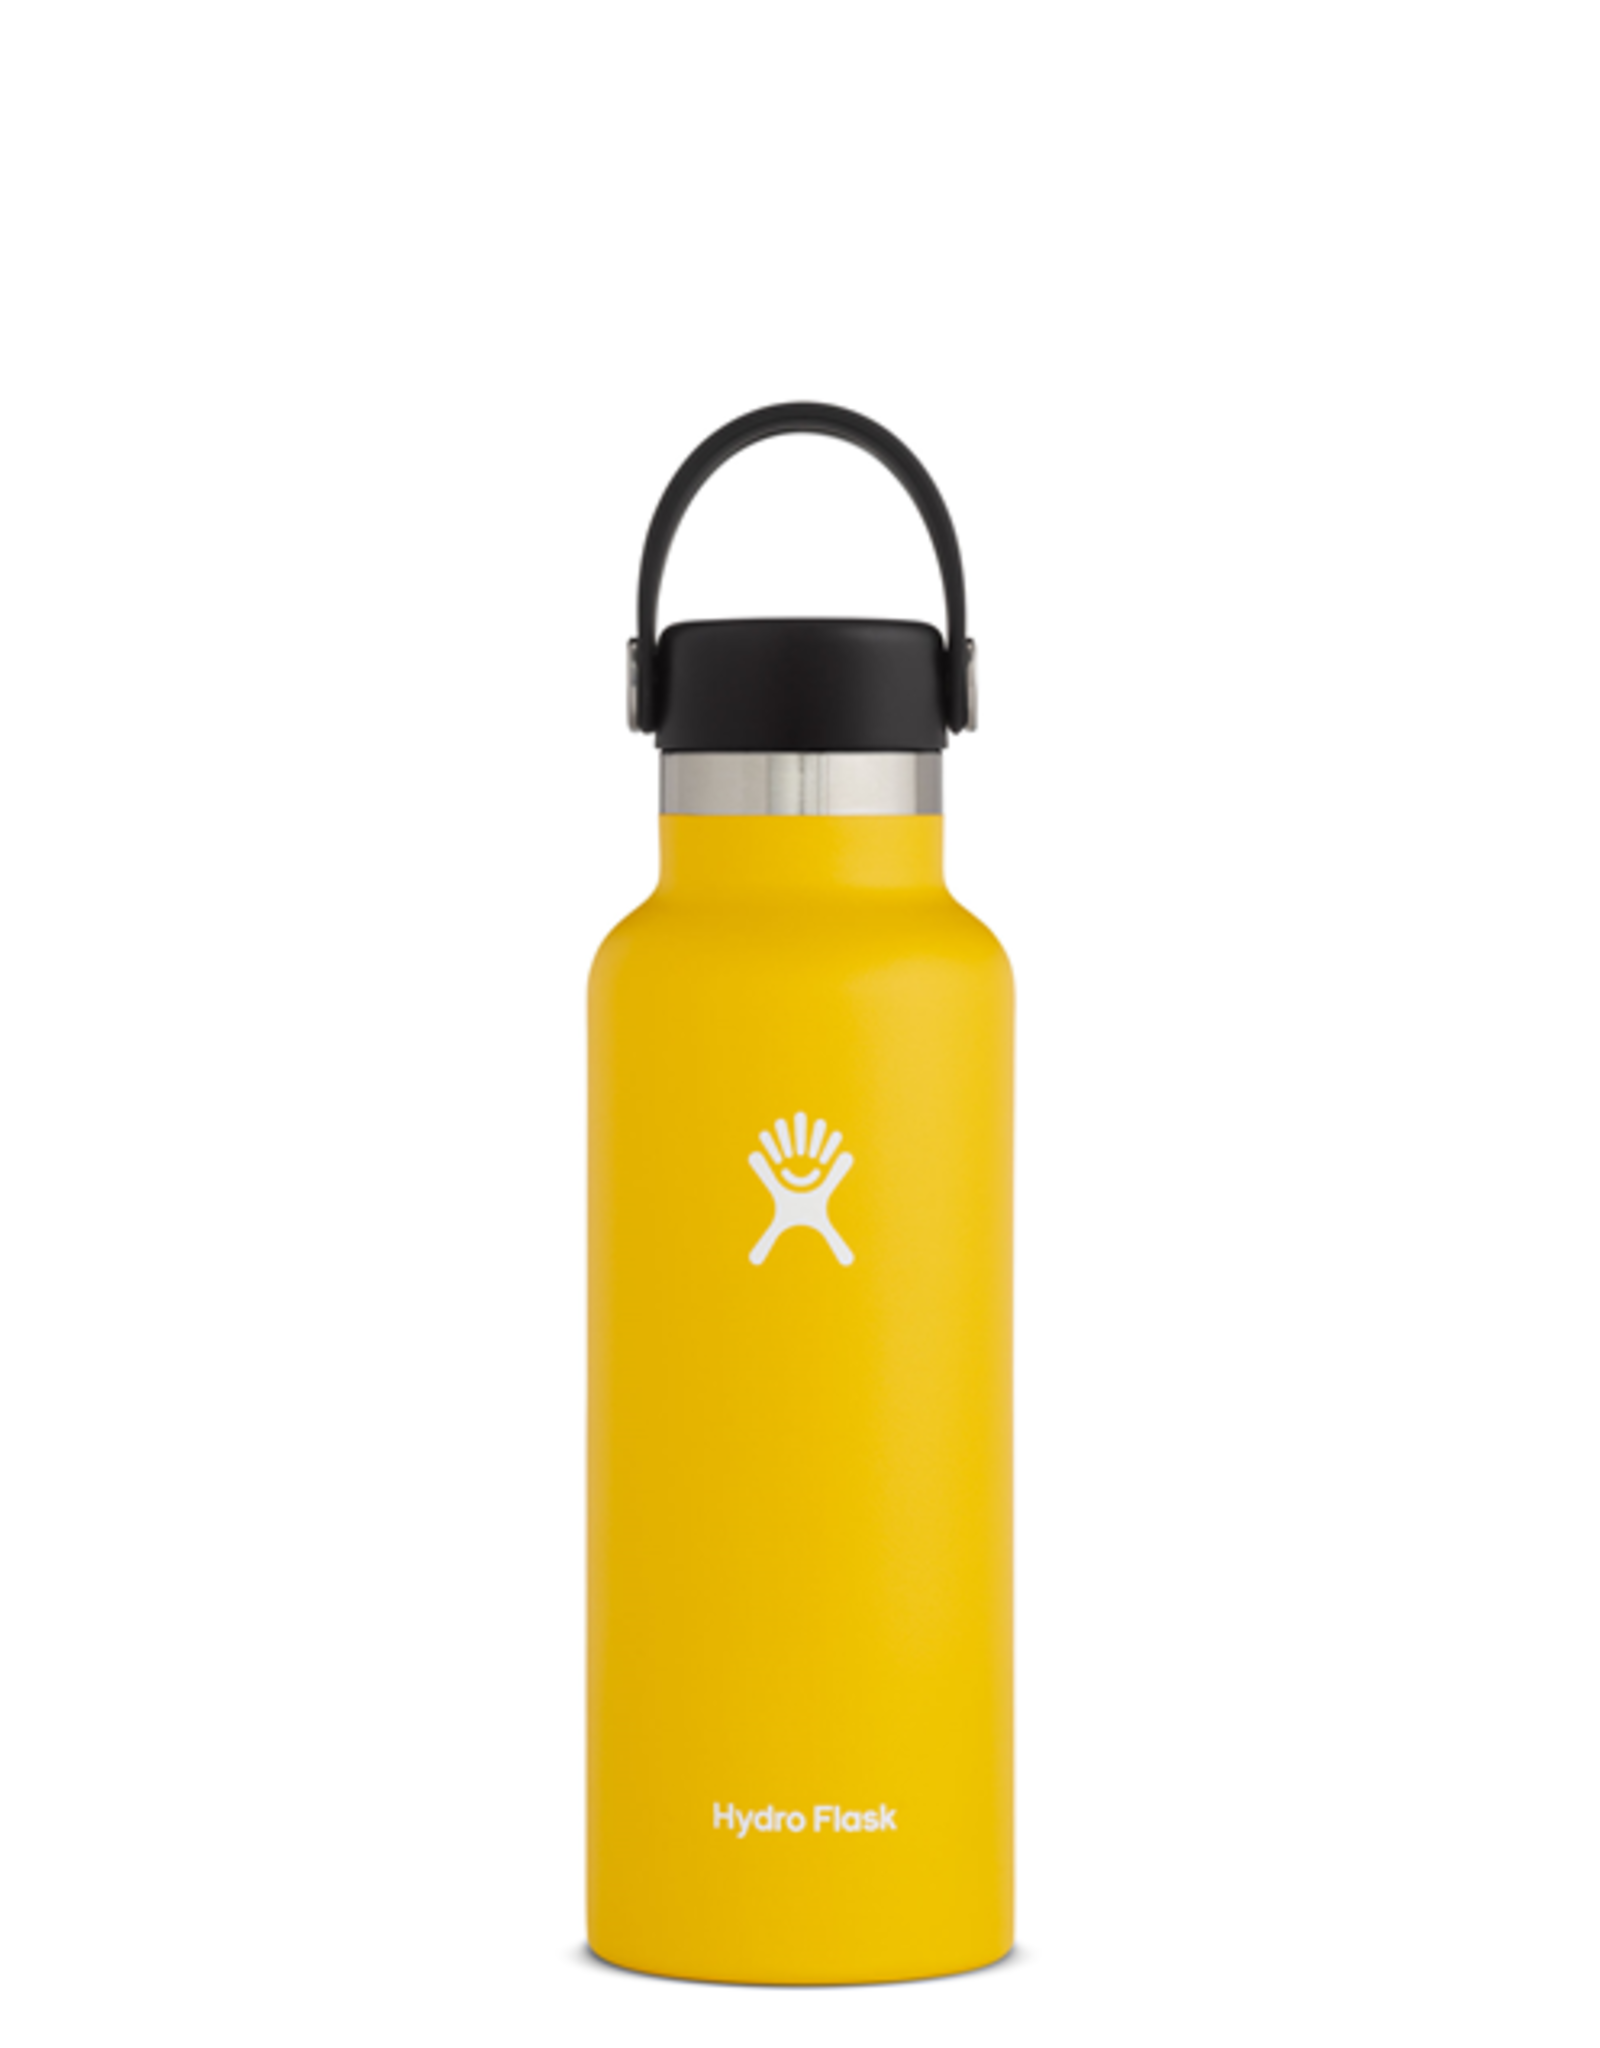 Hydro Flask - 18 OZ. STANDARD MOUTH